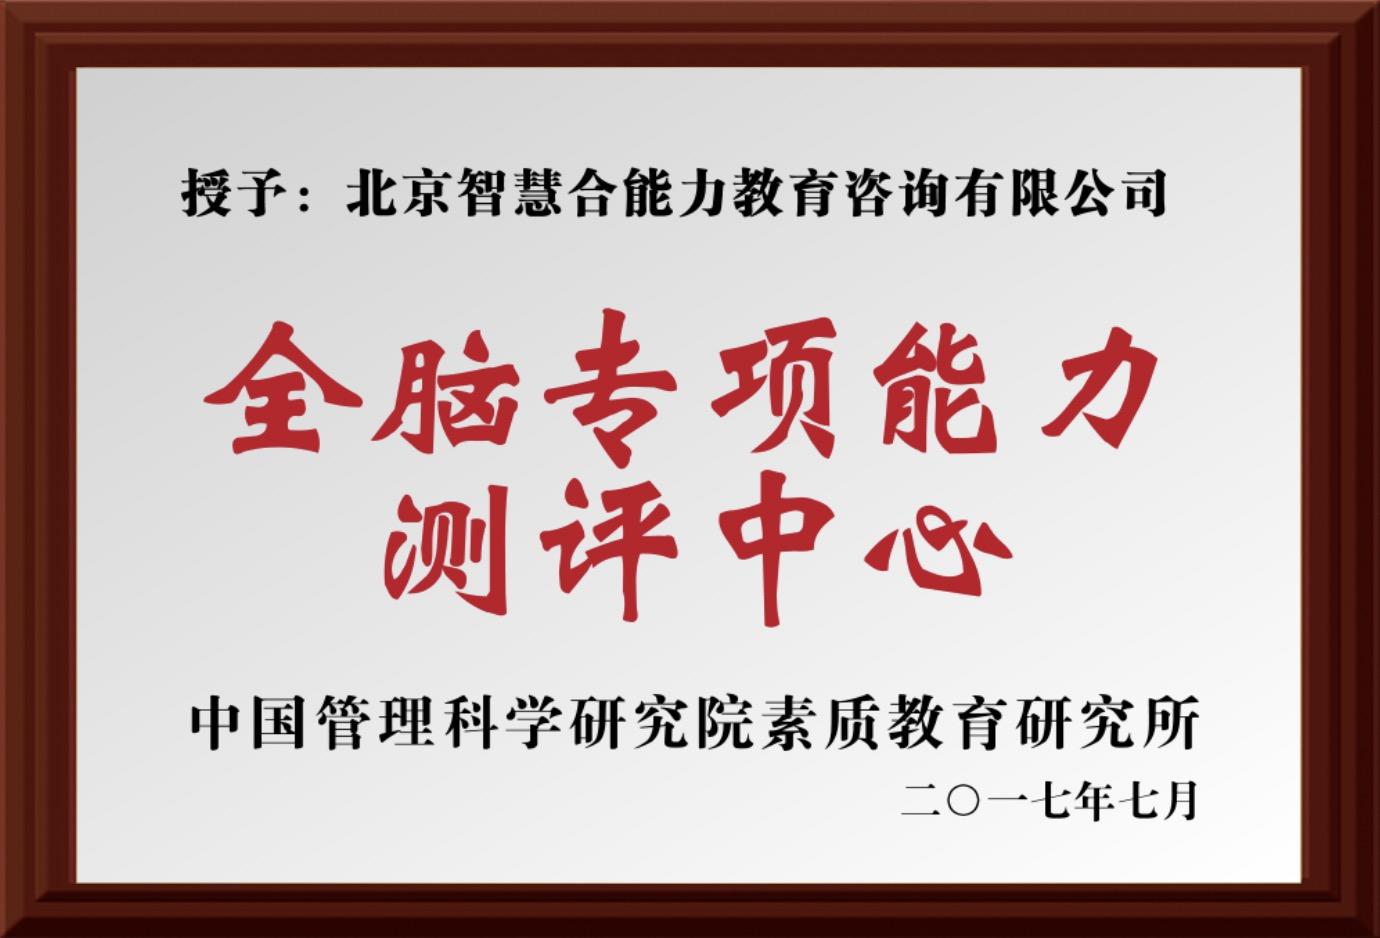 "<span style=""color:#FFFFFF;font-size:14px;"">中国管理科学研究院素质教育研究所二零一七年七月授予北京智慧合能力教育咨询有限公司为全脑专项能力测评中心</span>"